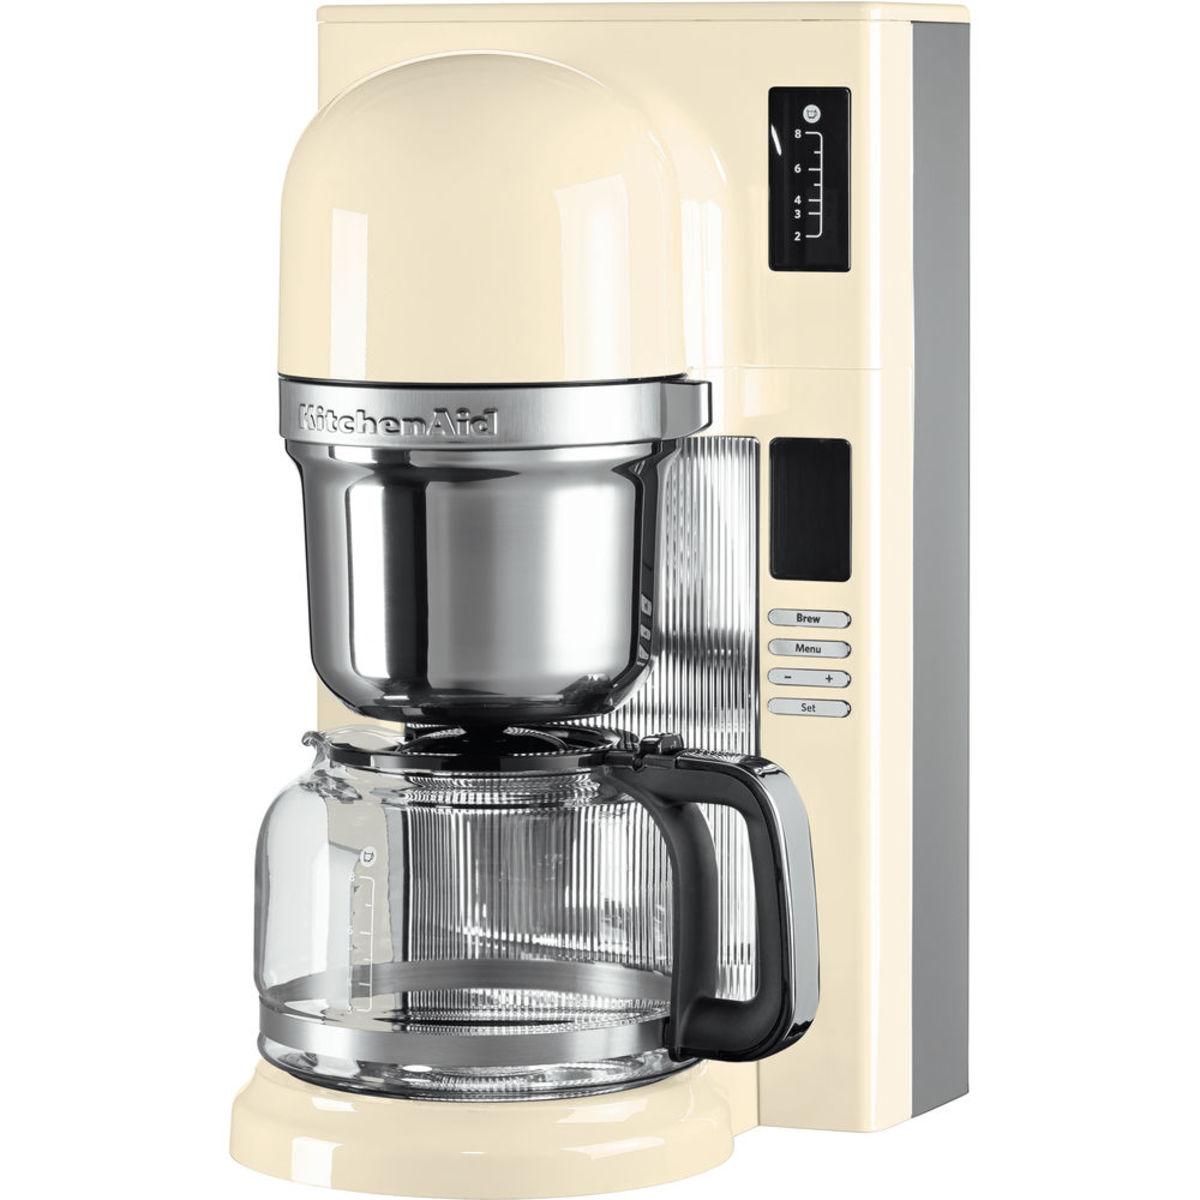 KitchenAid 5KCM0802BAC Pour Over Coffee Brewer, Almond Cream